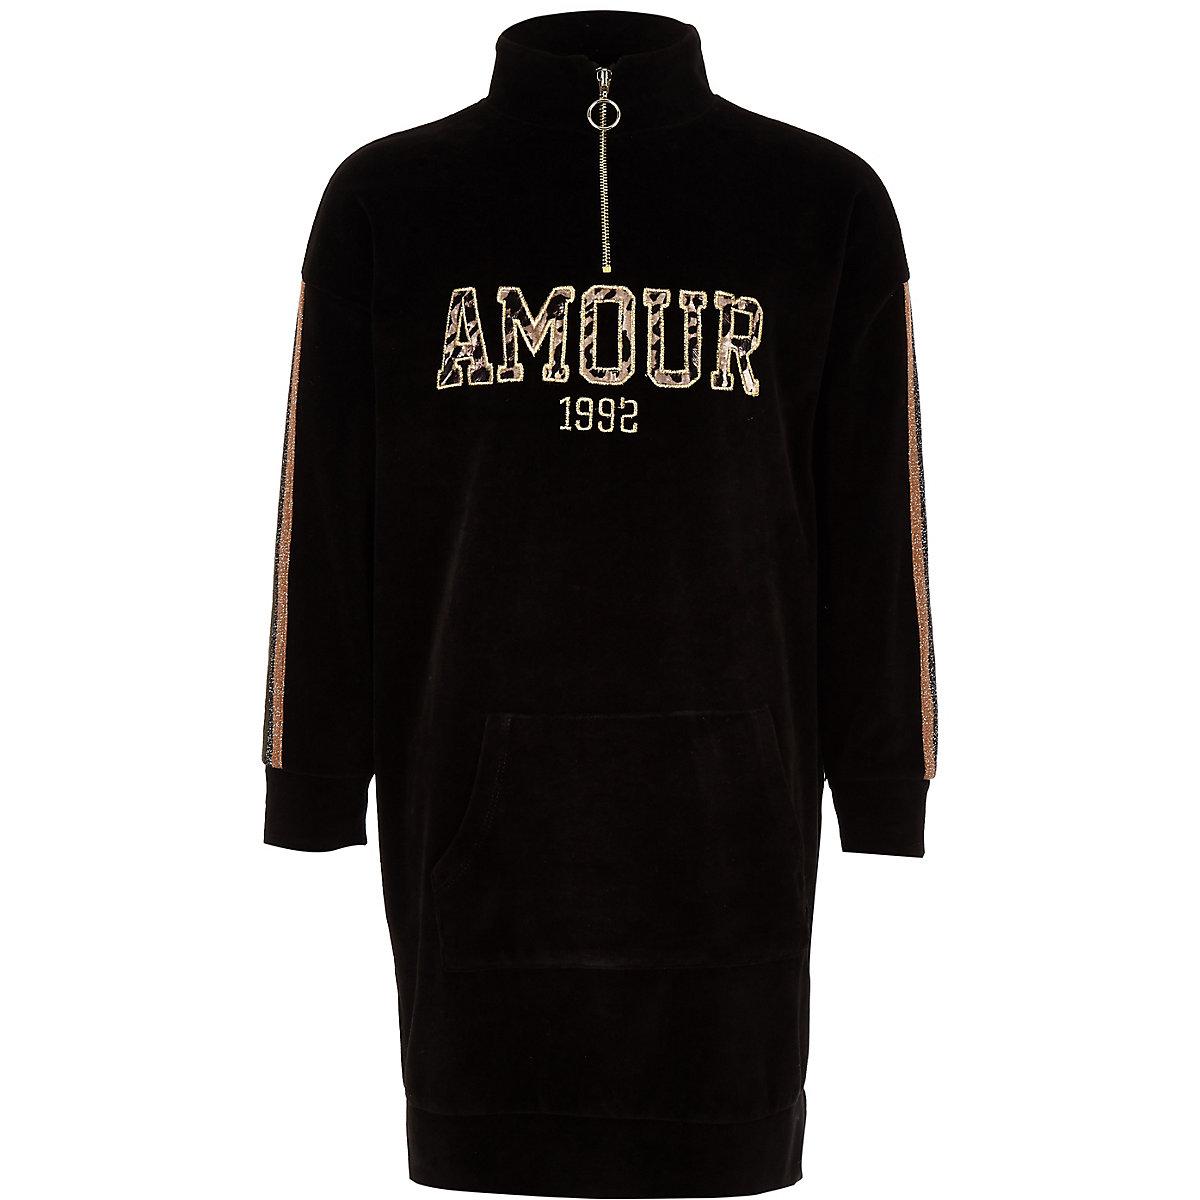 Girls black 'Amour' funnel neck sweater dress